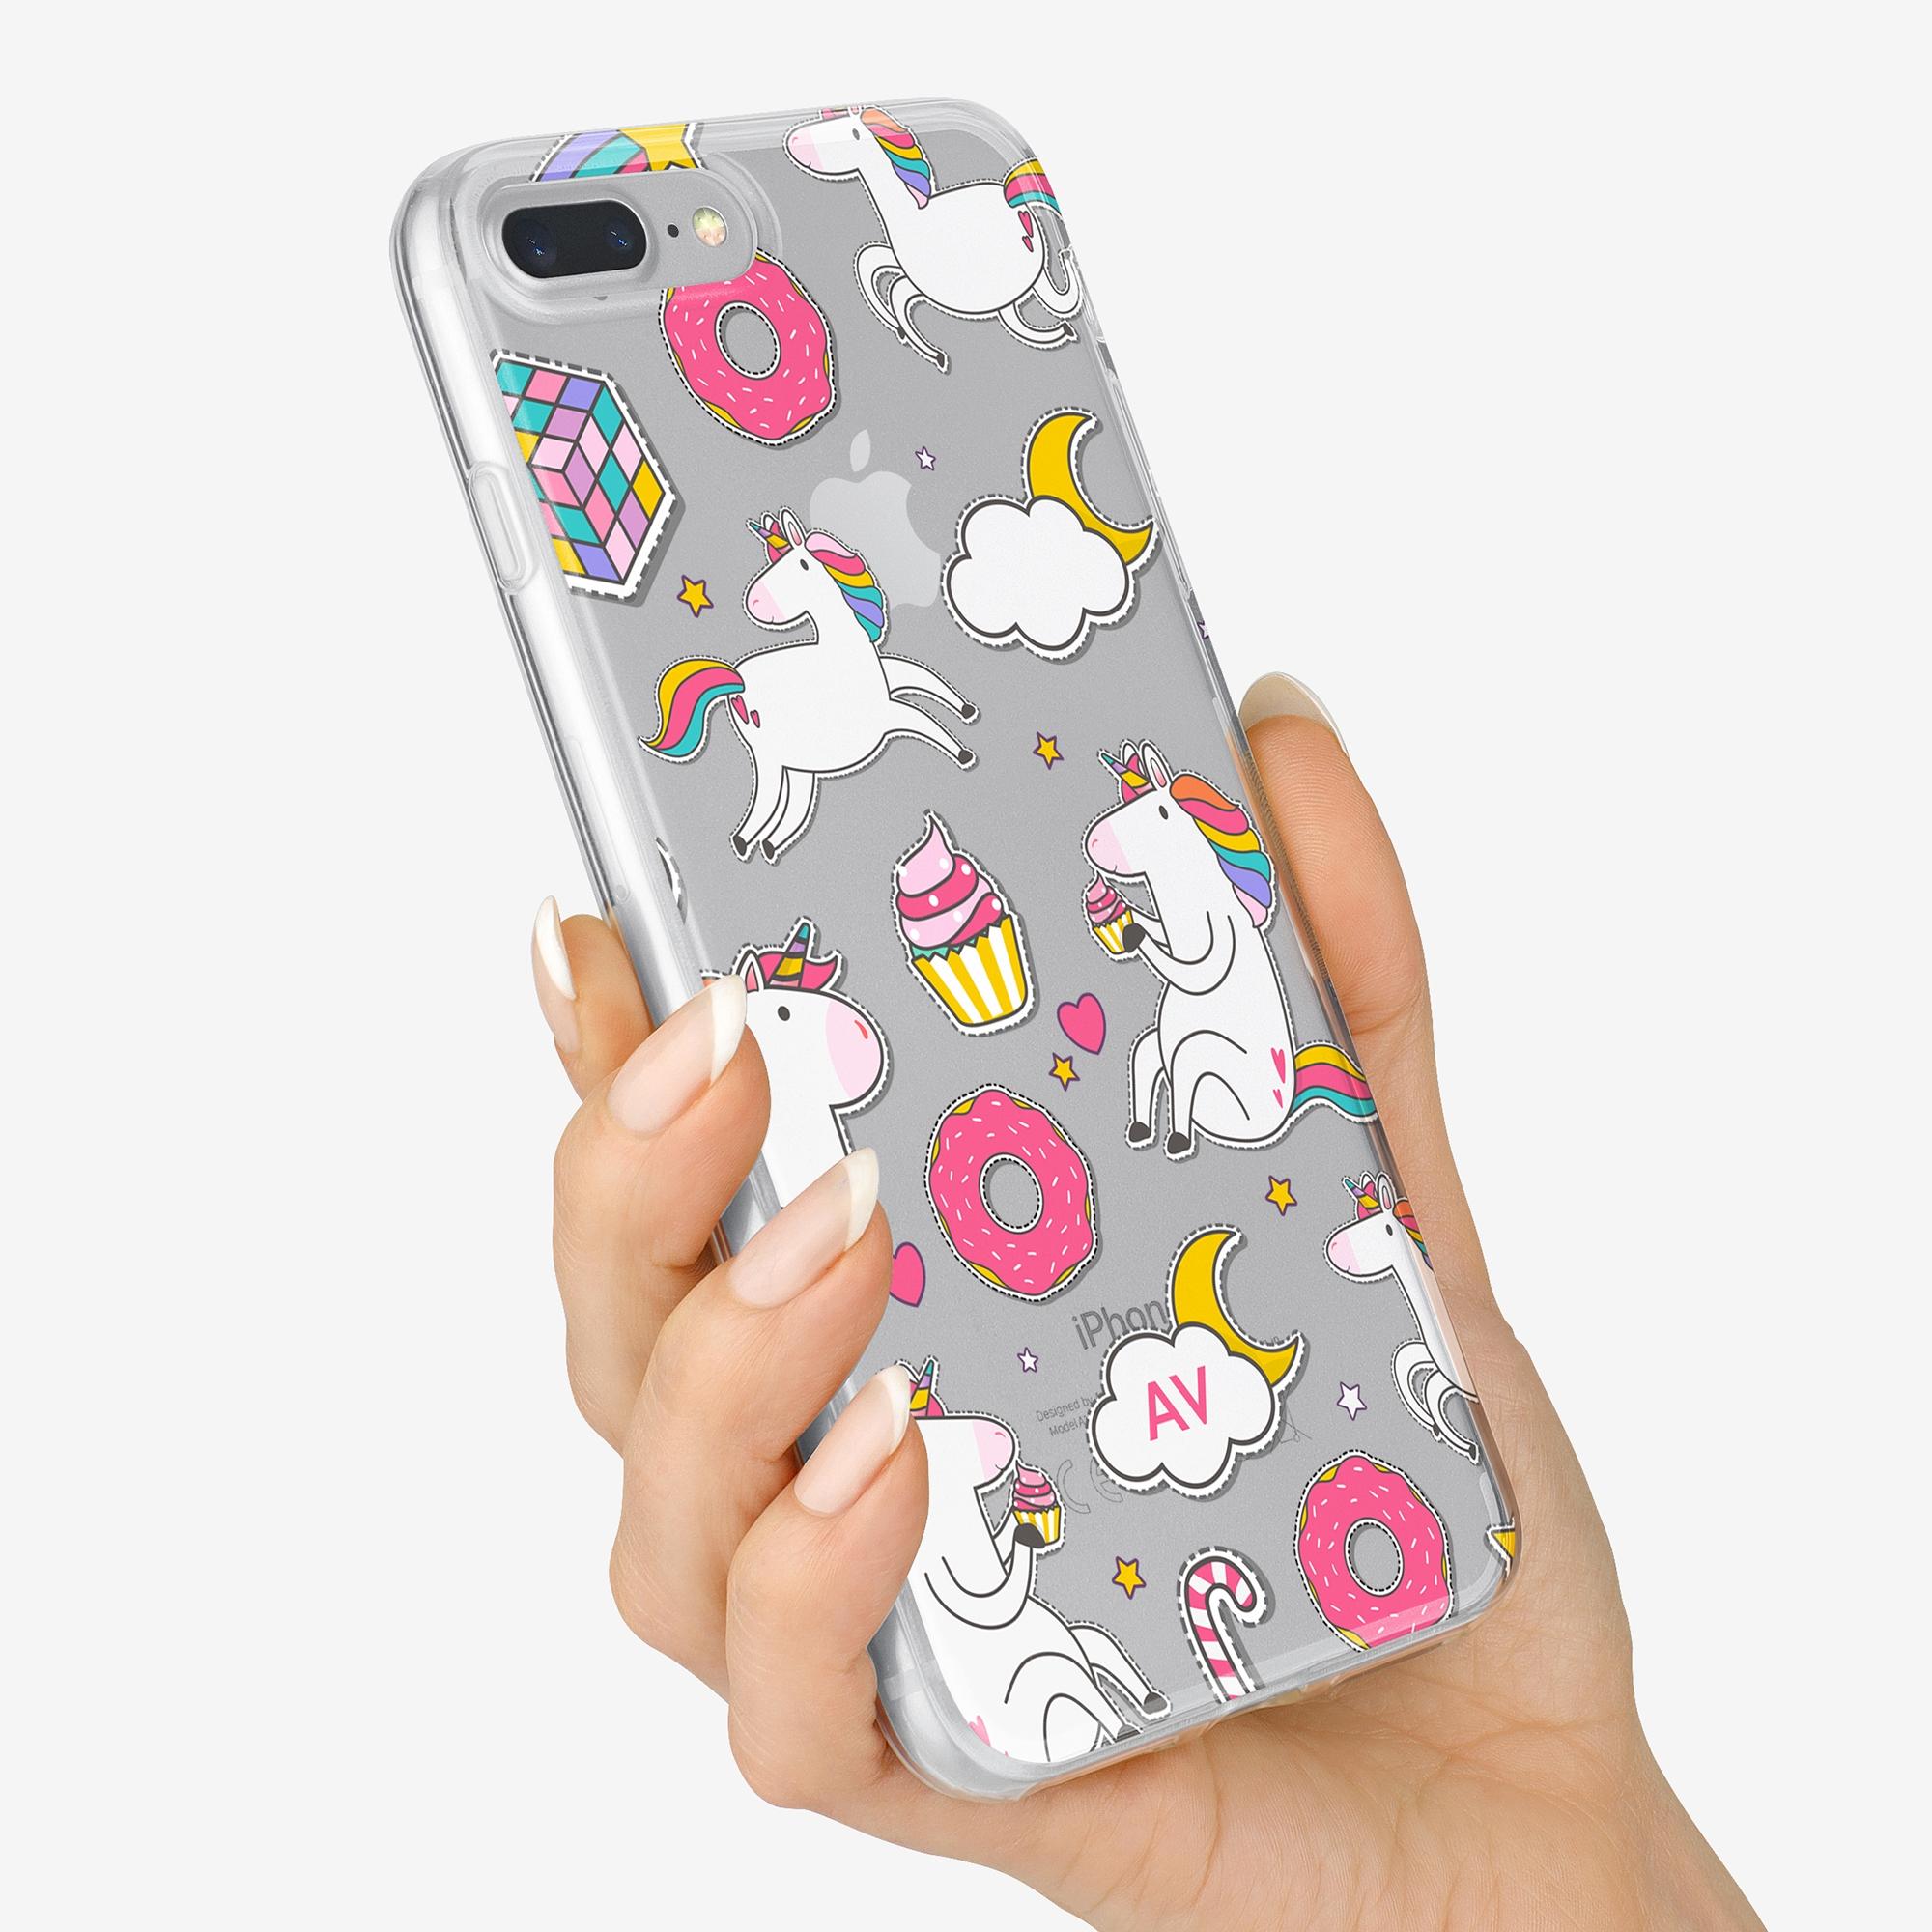 Galaxy S7 Clear Soft Silicone Case 14656